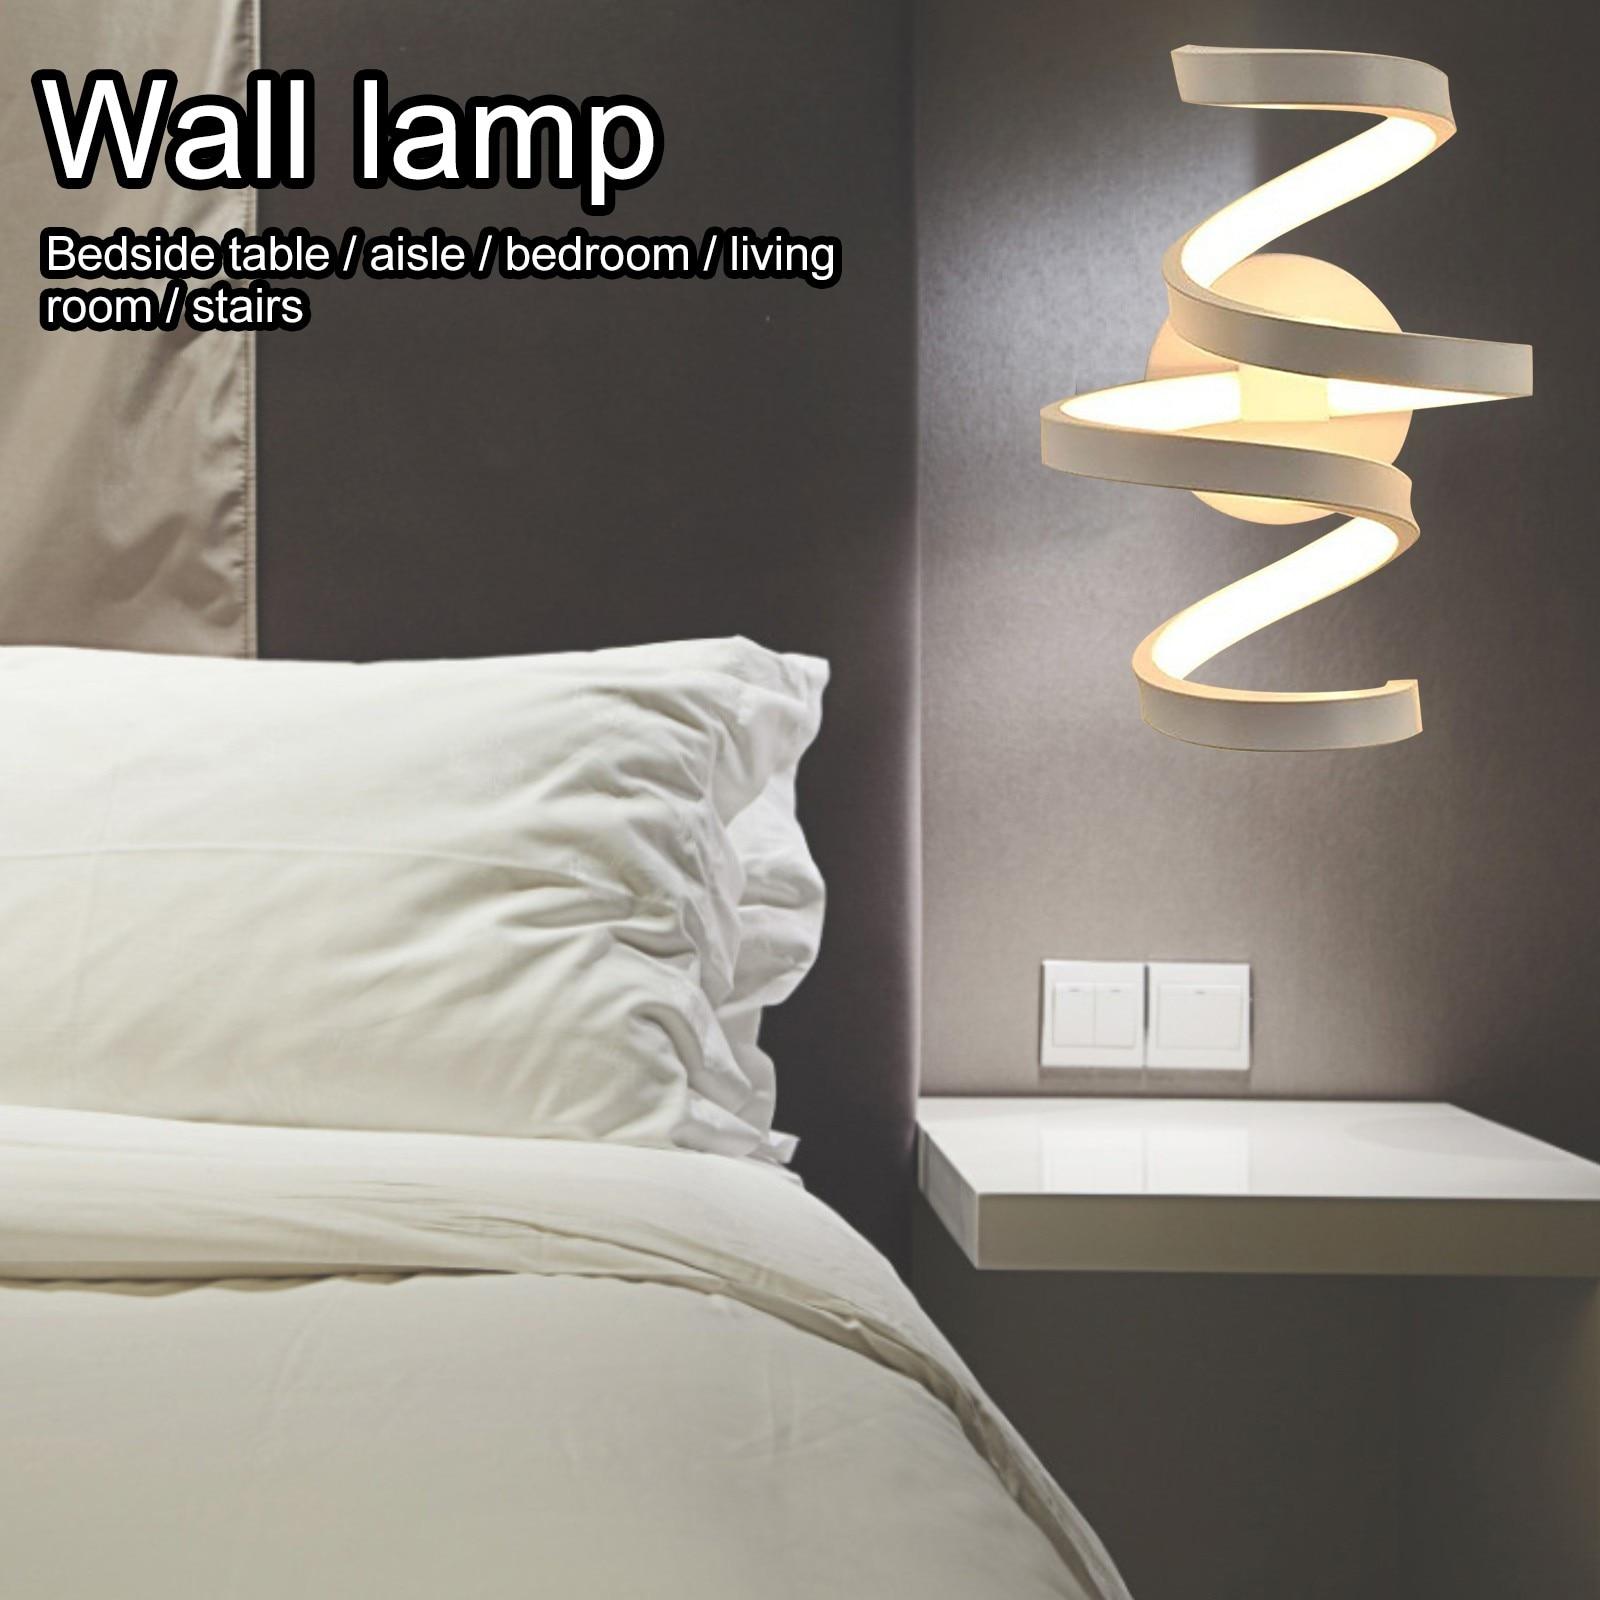 LED ليلة ضوء البساطة نوم الجدار مصباح السرير مكتب موضة وحدة إضاءة LED جداريّة مصباح الممر الدرج الإبداع نوم ديكور المنزل